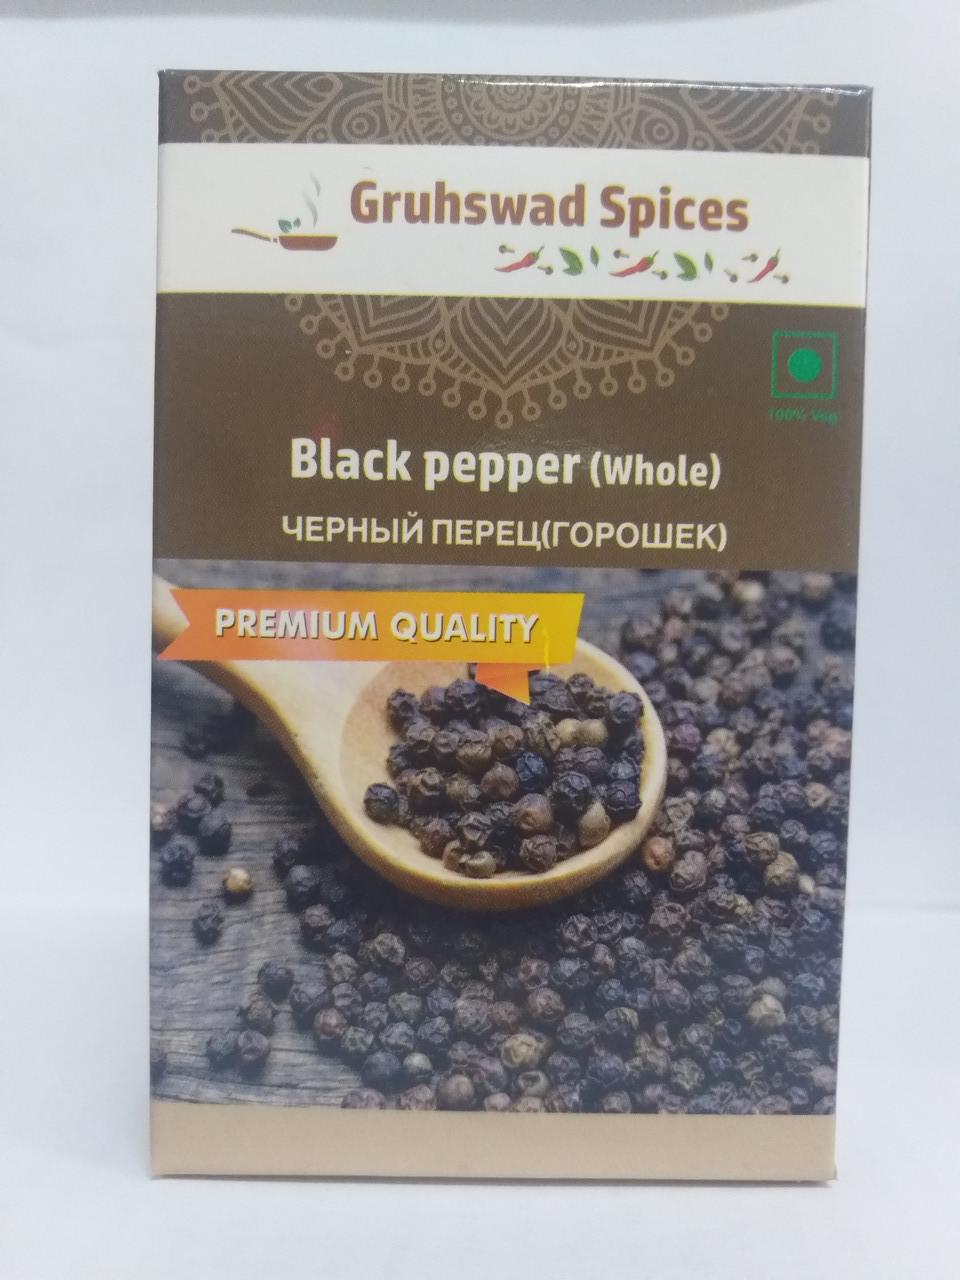 Черный перец горошек, 50 гр, Black pepper (Whole), Gruhswad Spices